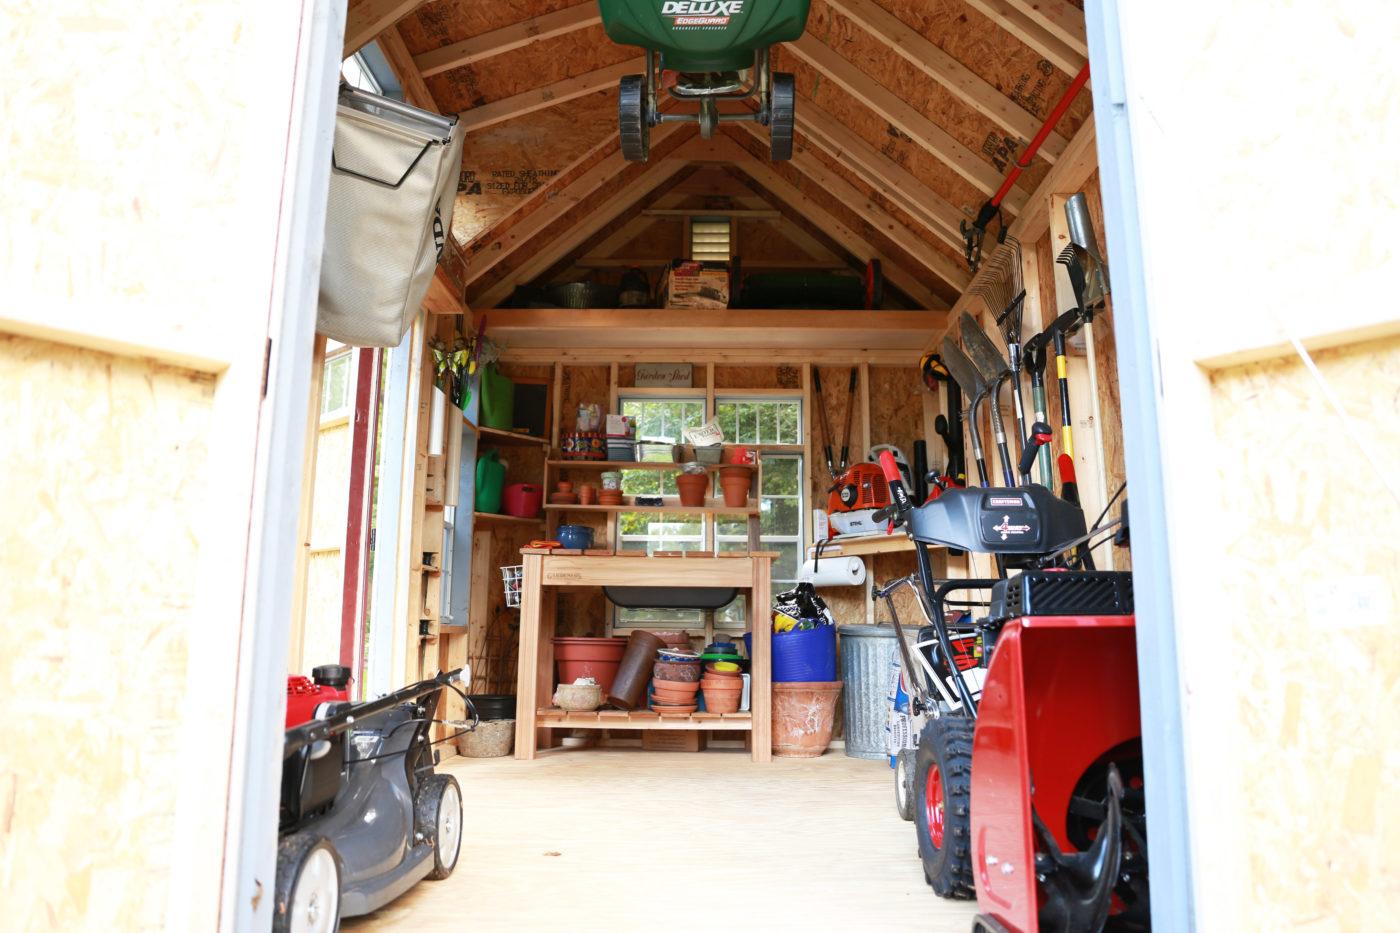 inside a premier storage shed